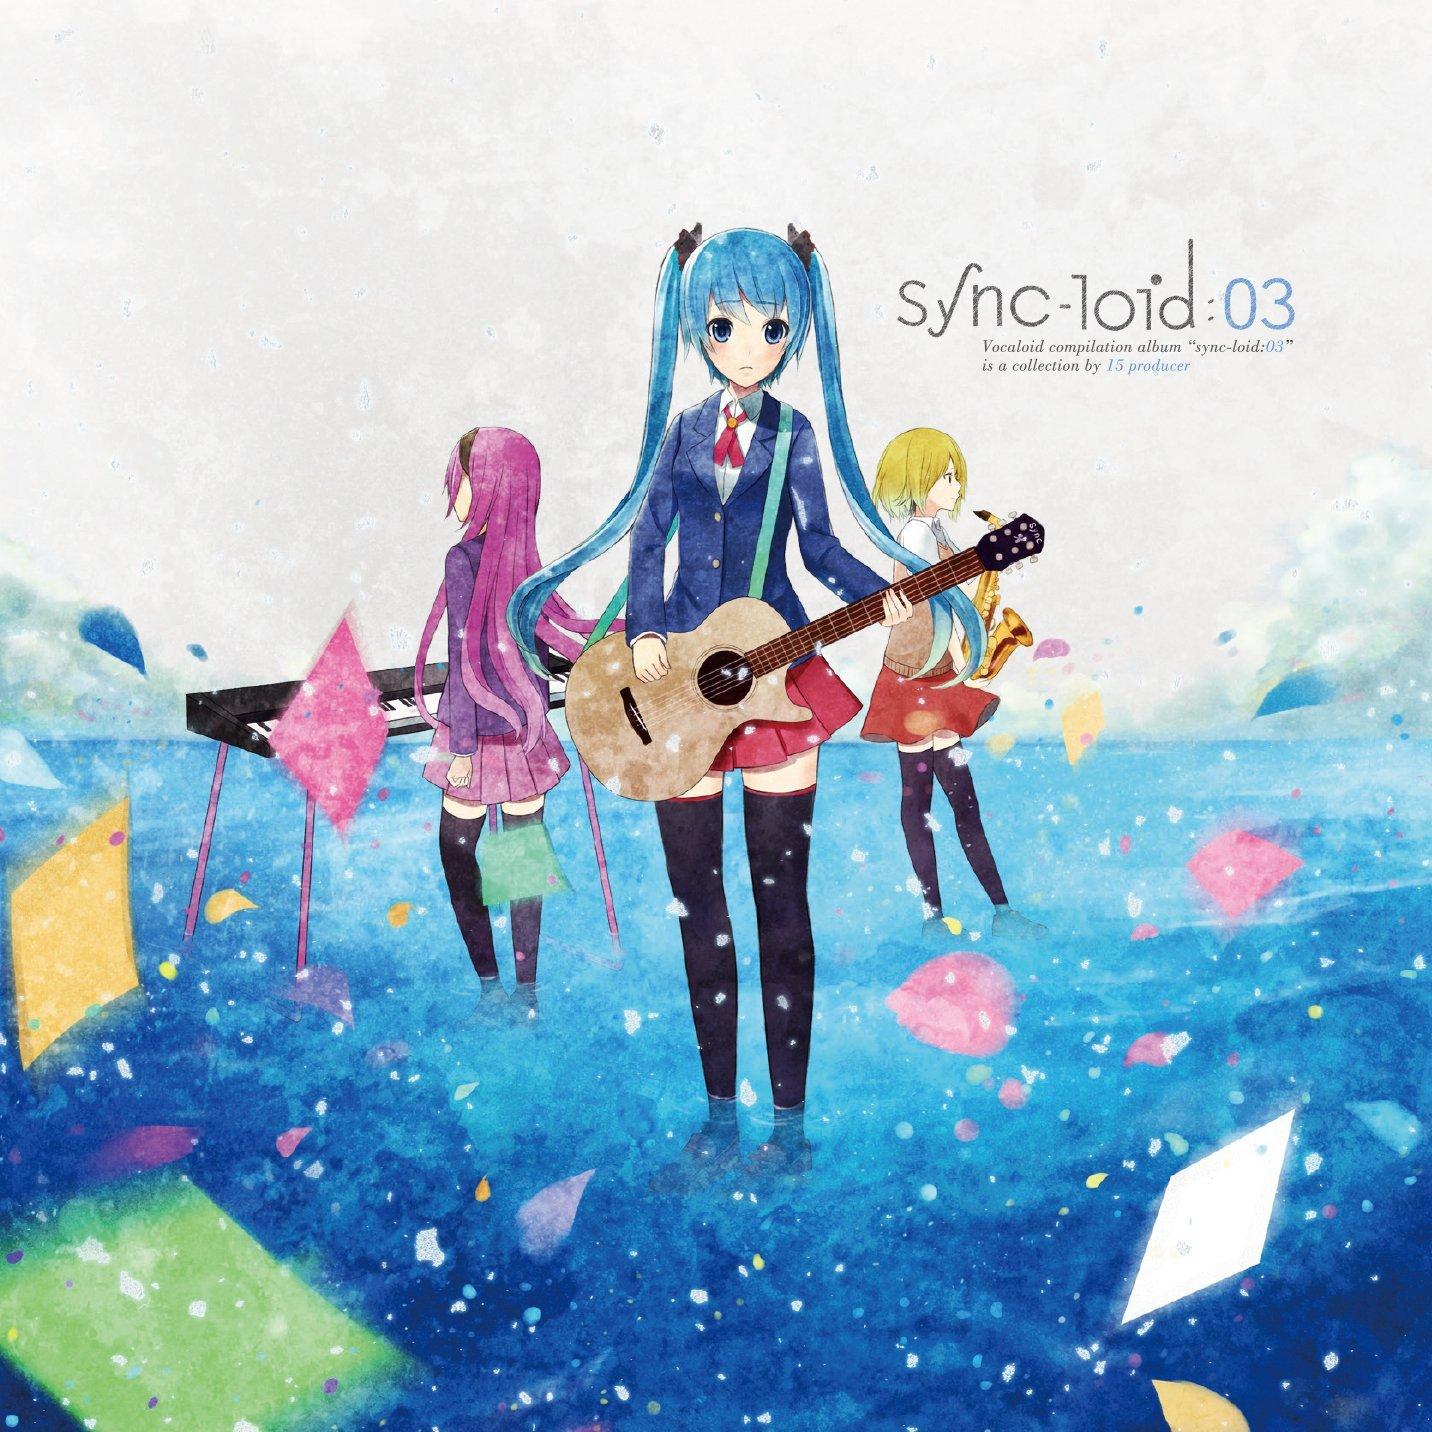 Sync-loid:03 (album)